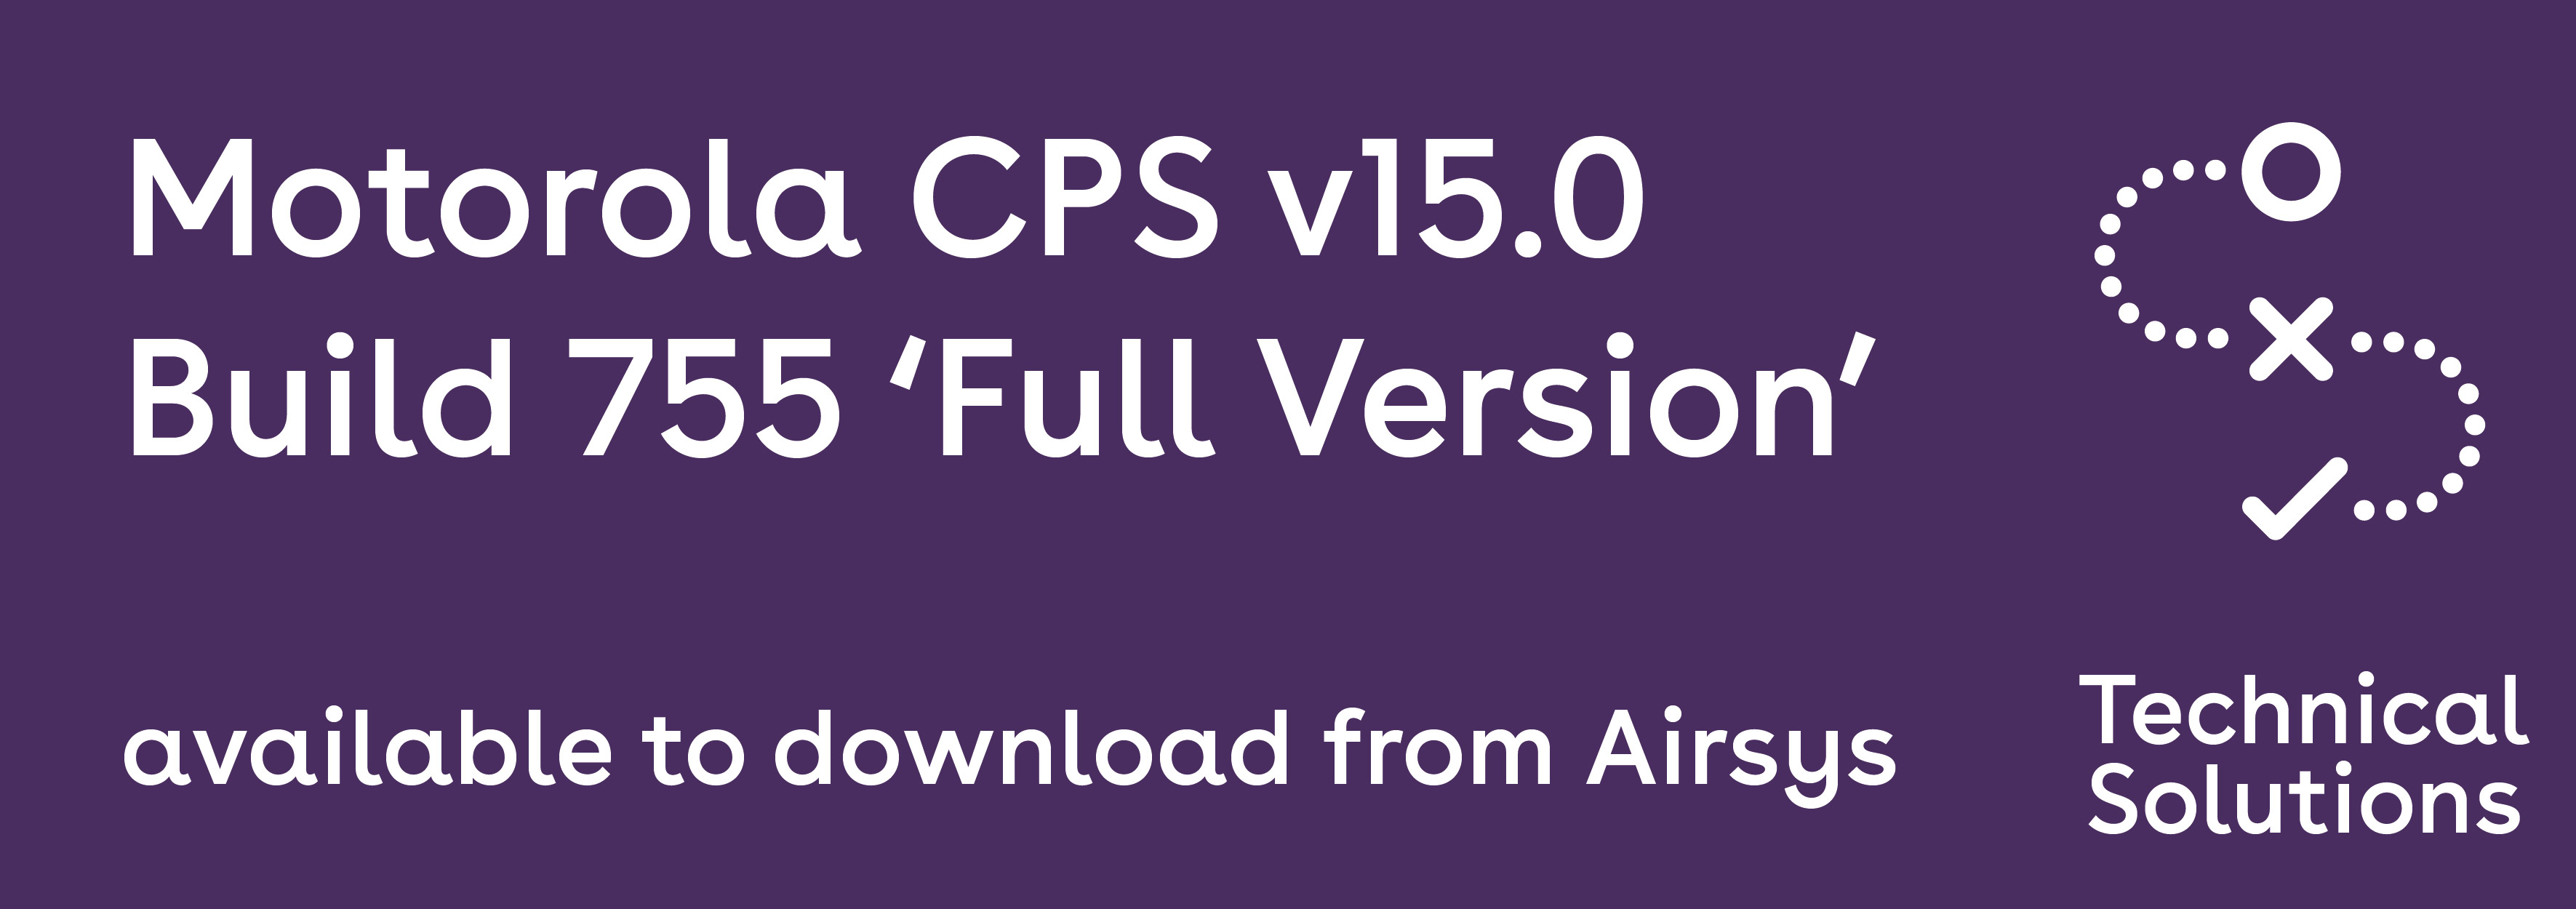 motorola cps versions - softwaremonster info